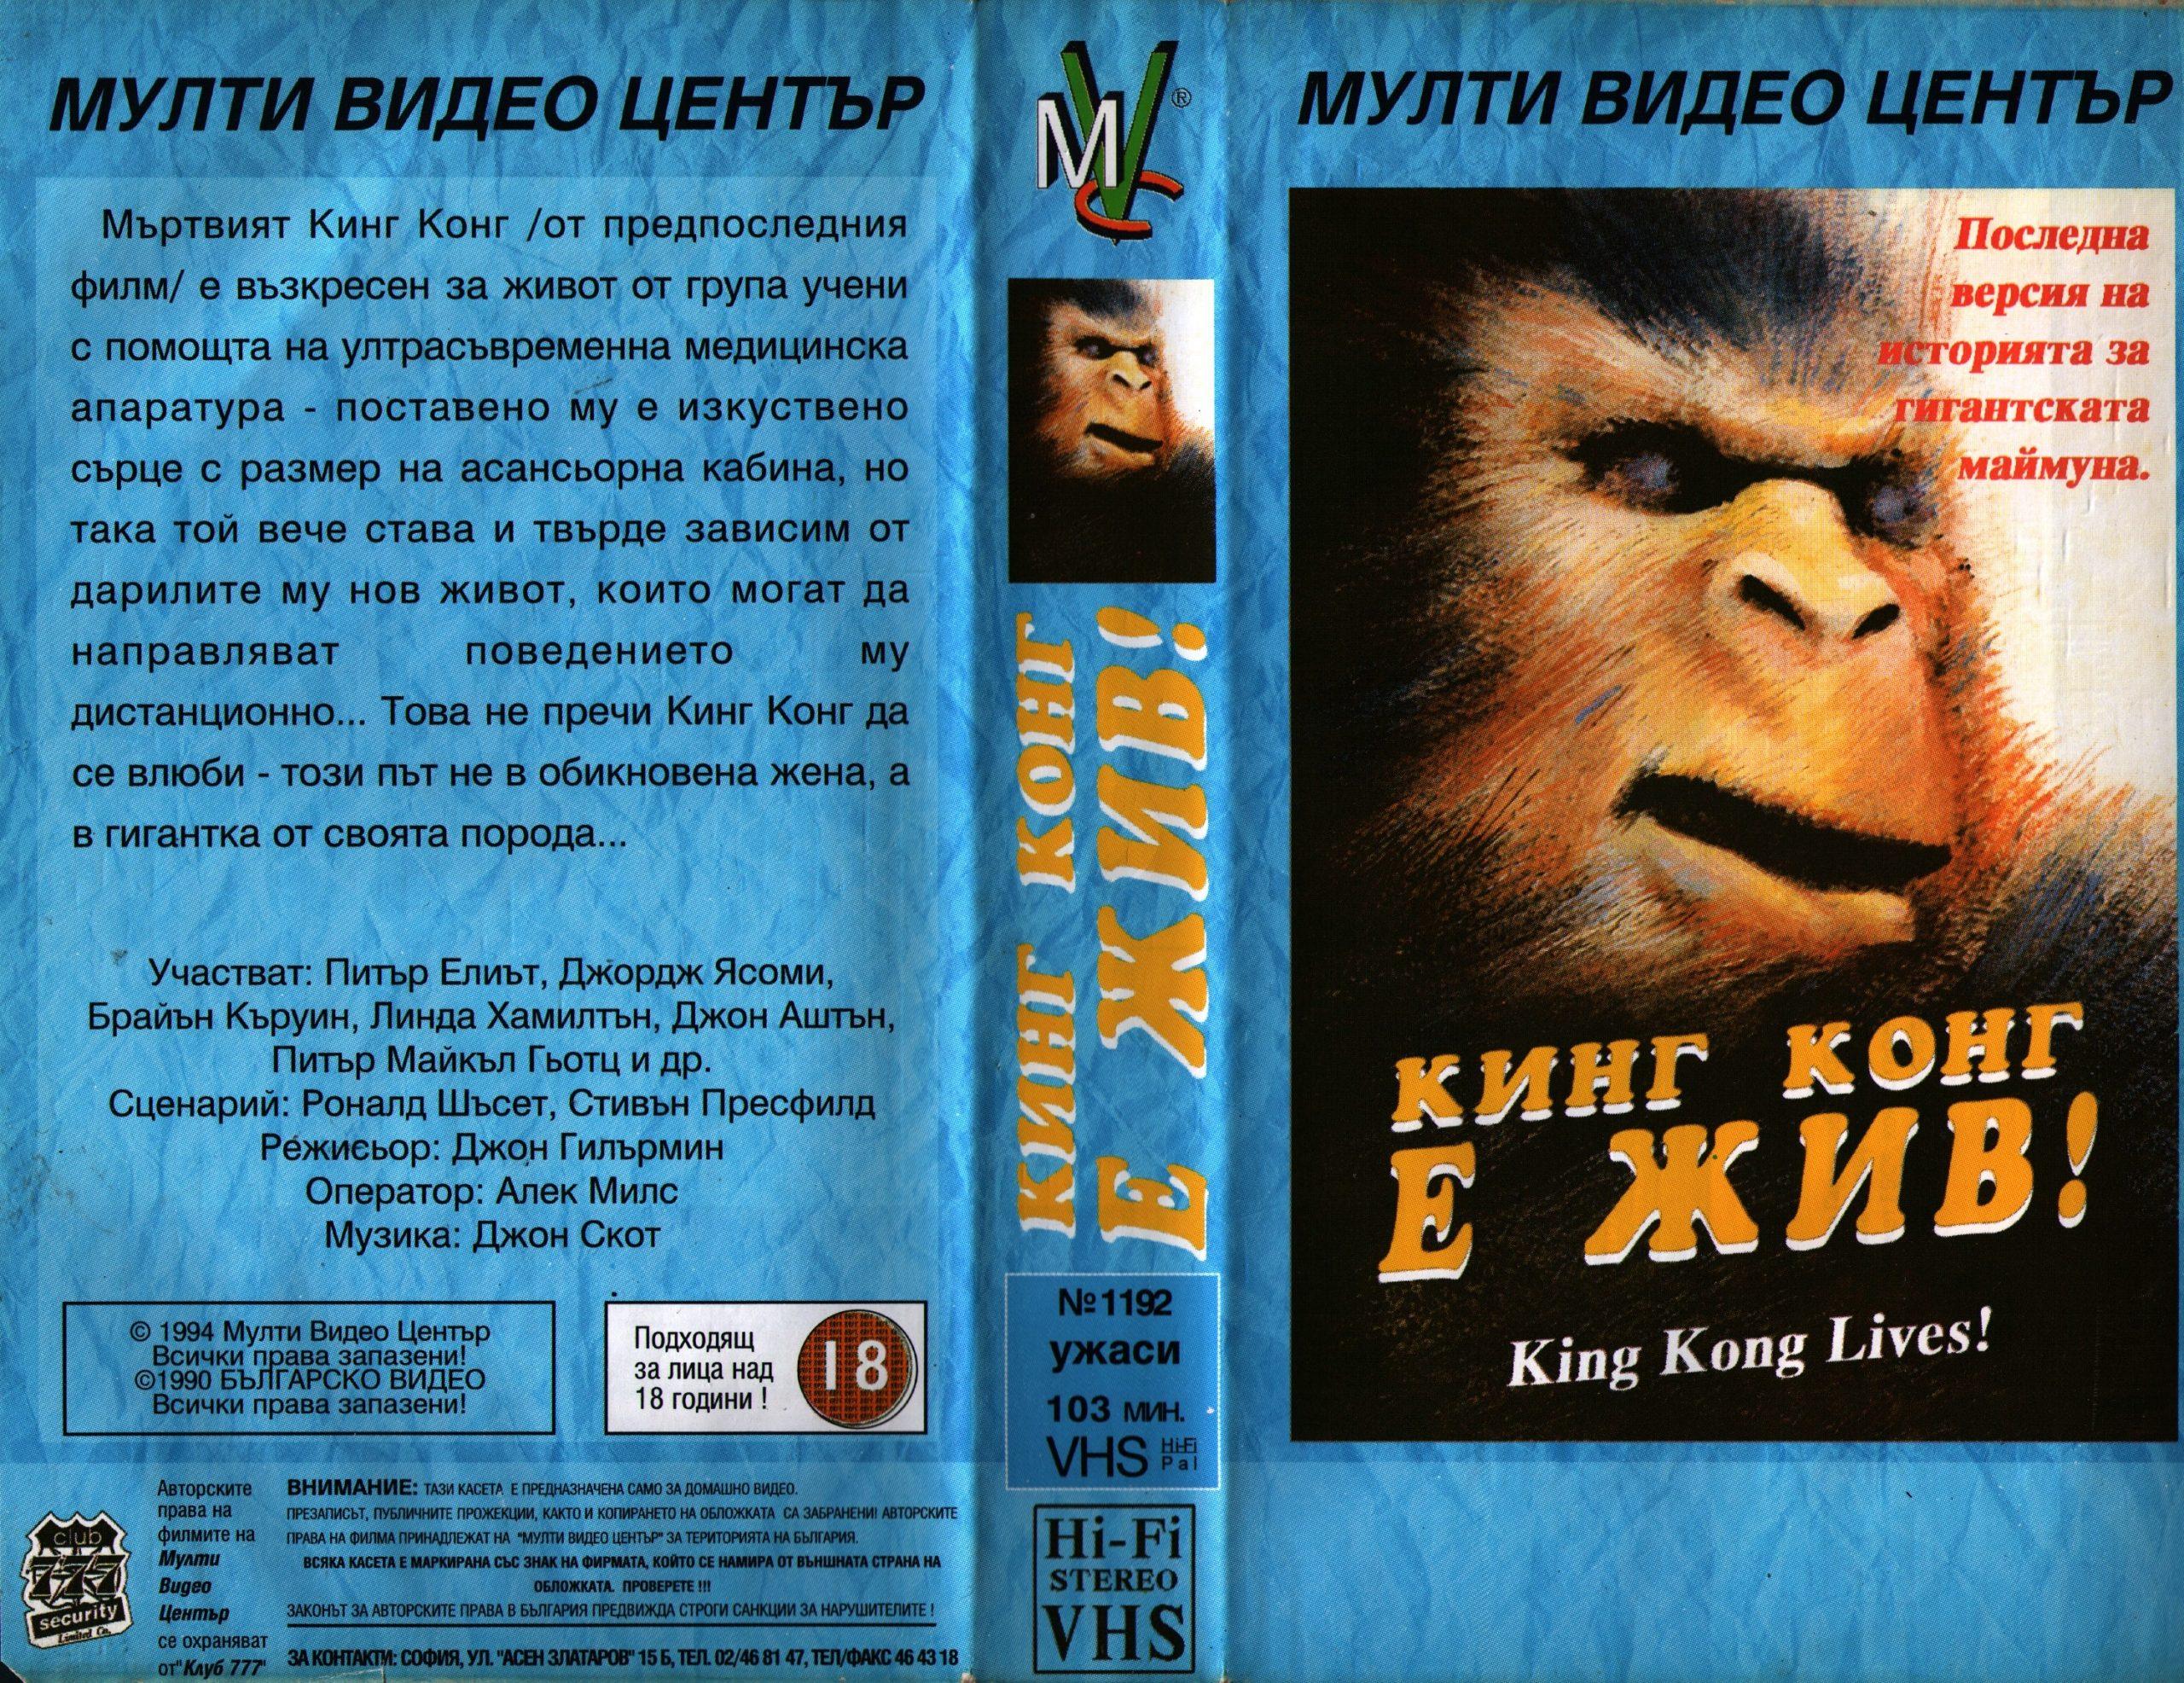 Кинг Конг е жив